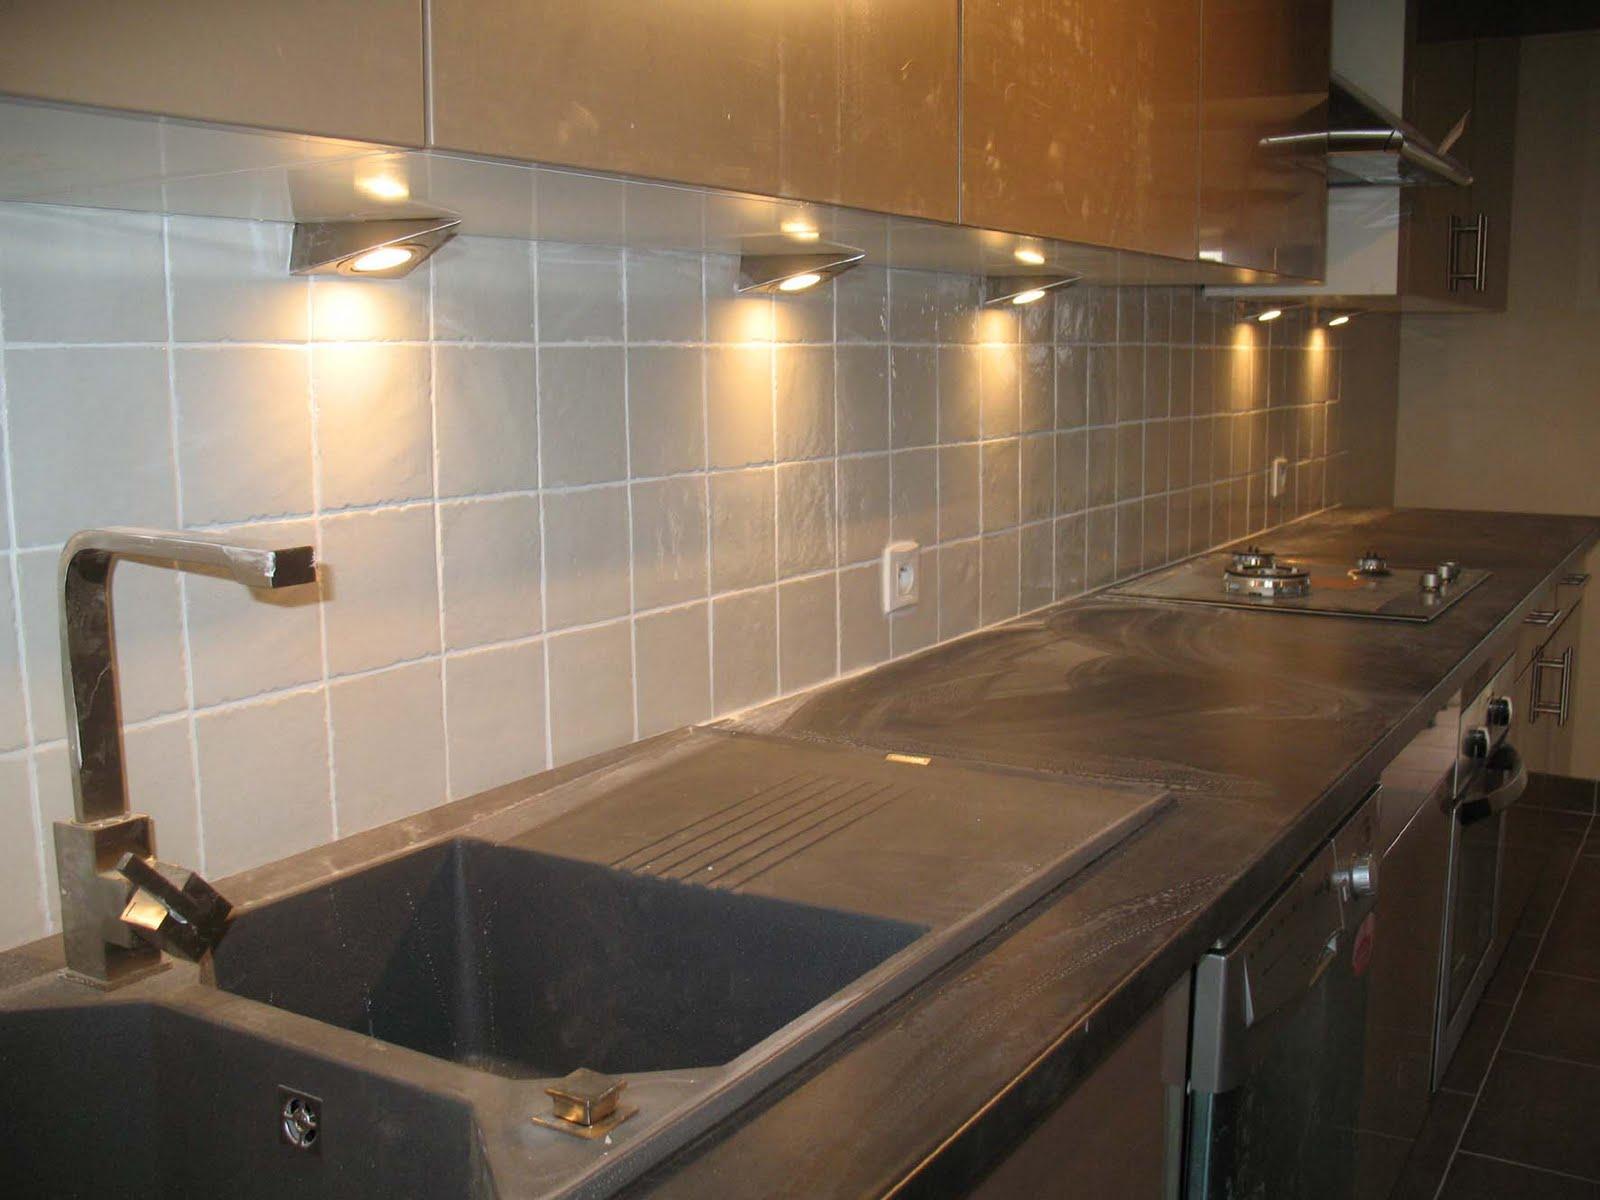 Peinture carrelage salle de bain mulhouse design - Peinture carrelage salle de bains ...